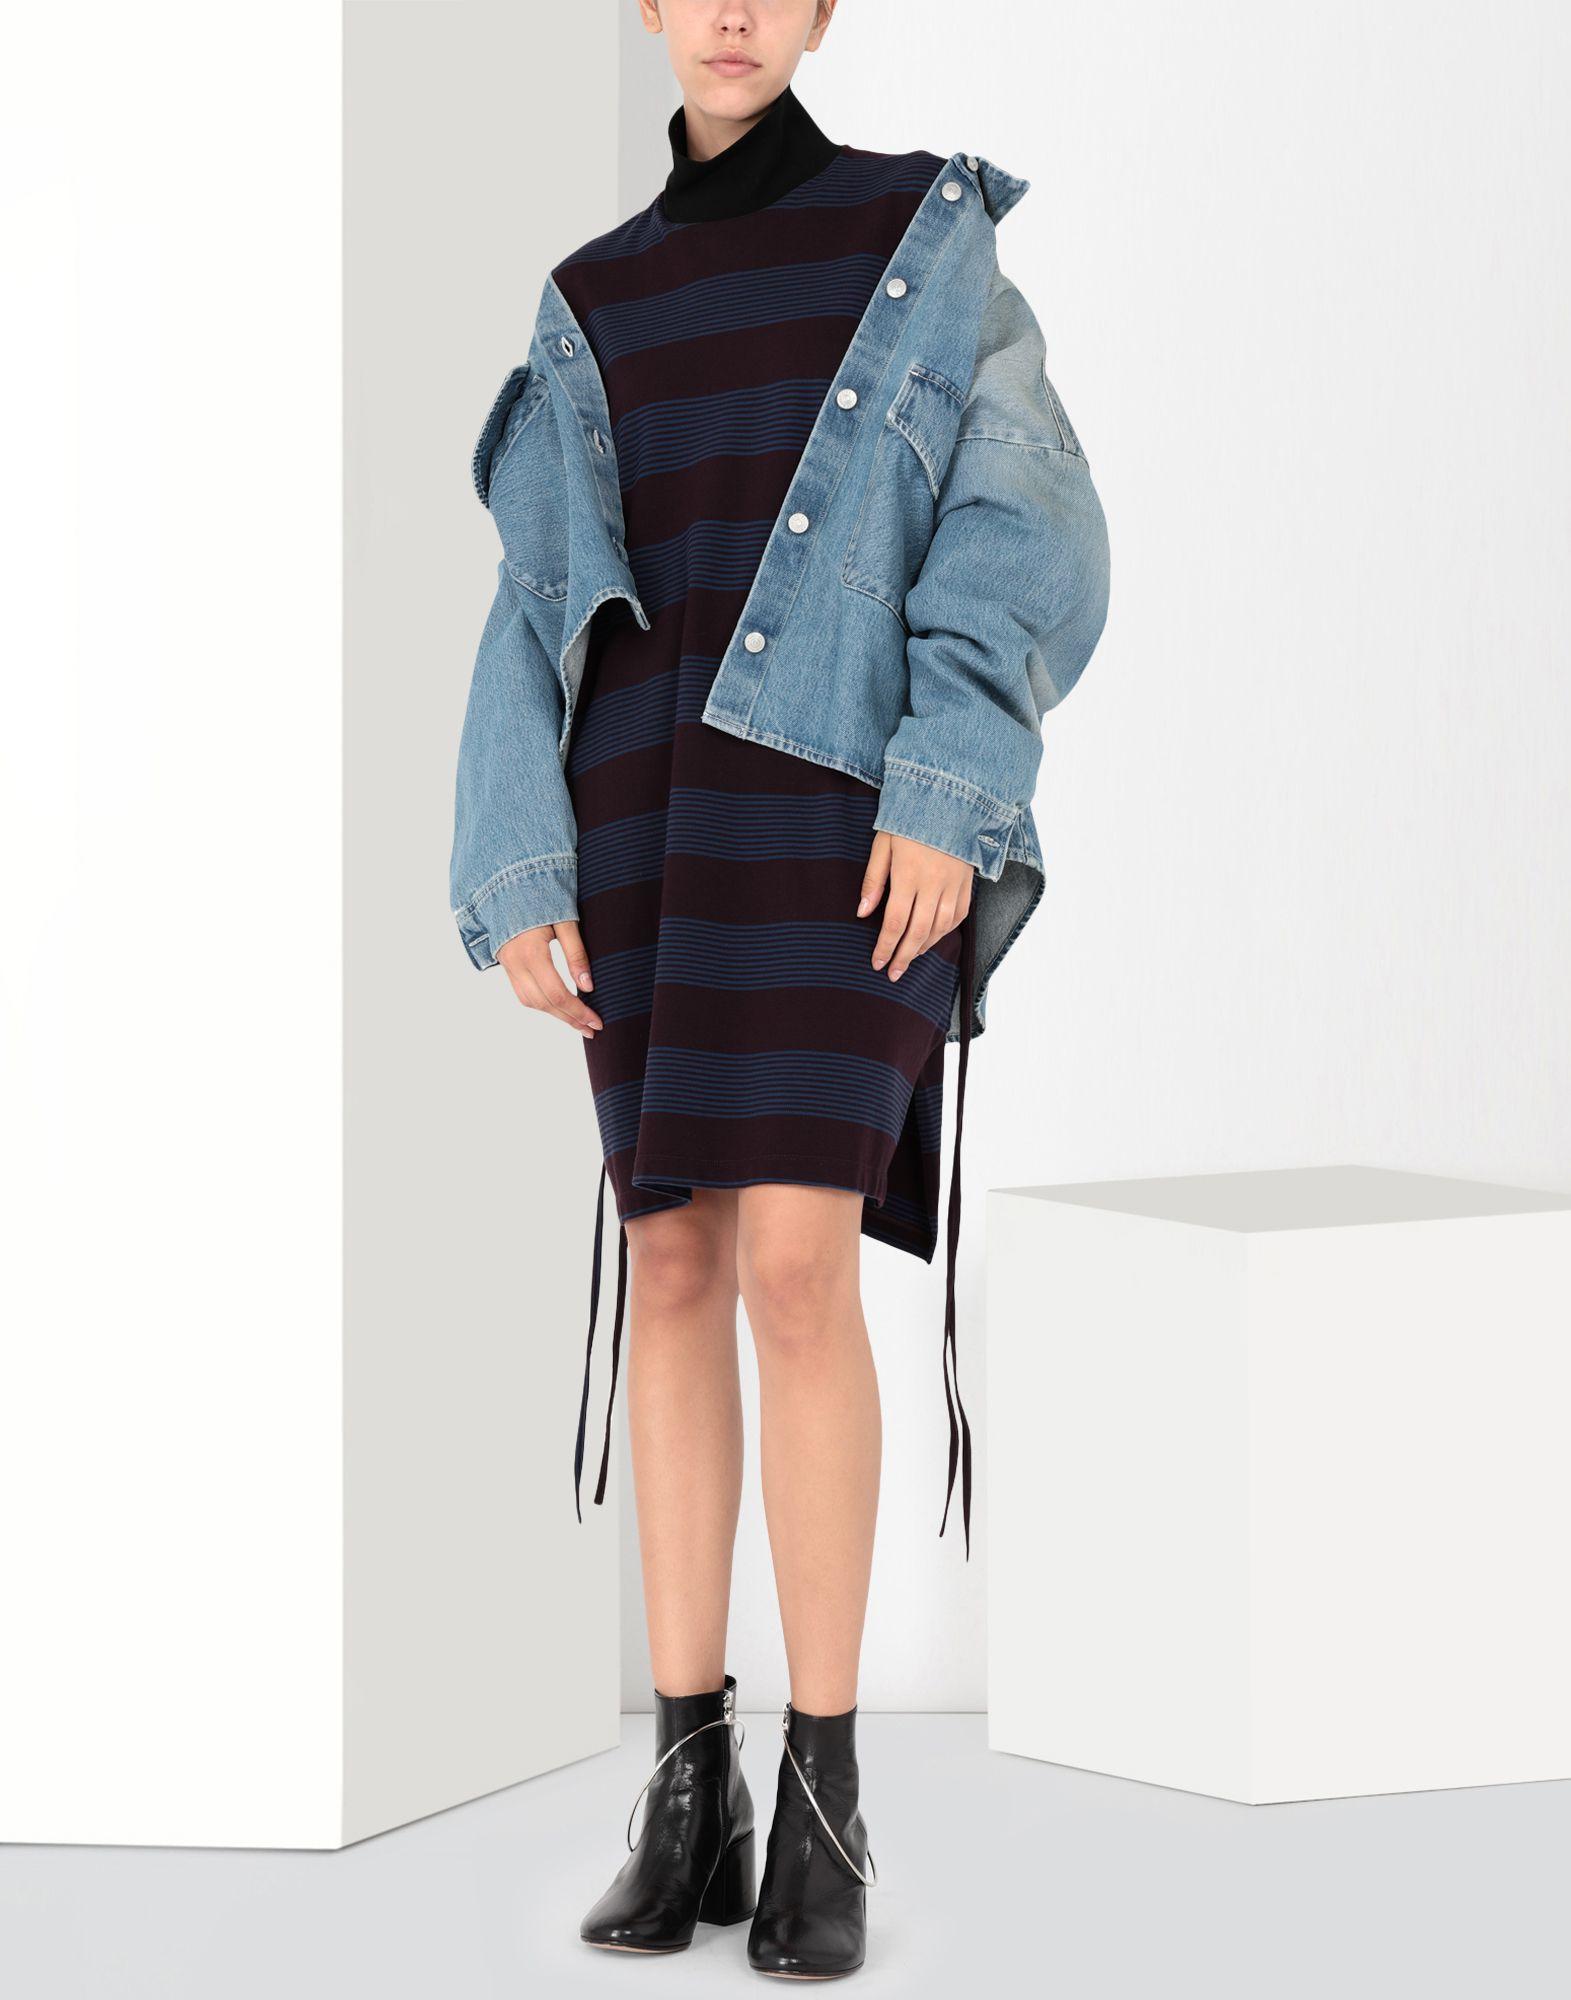 MM6 MAISON MARGIELA Striped jersey dress Short dress Woman r